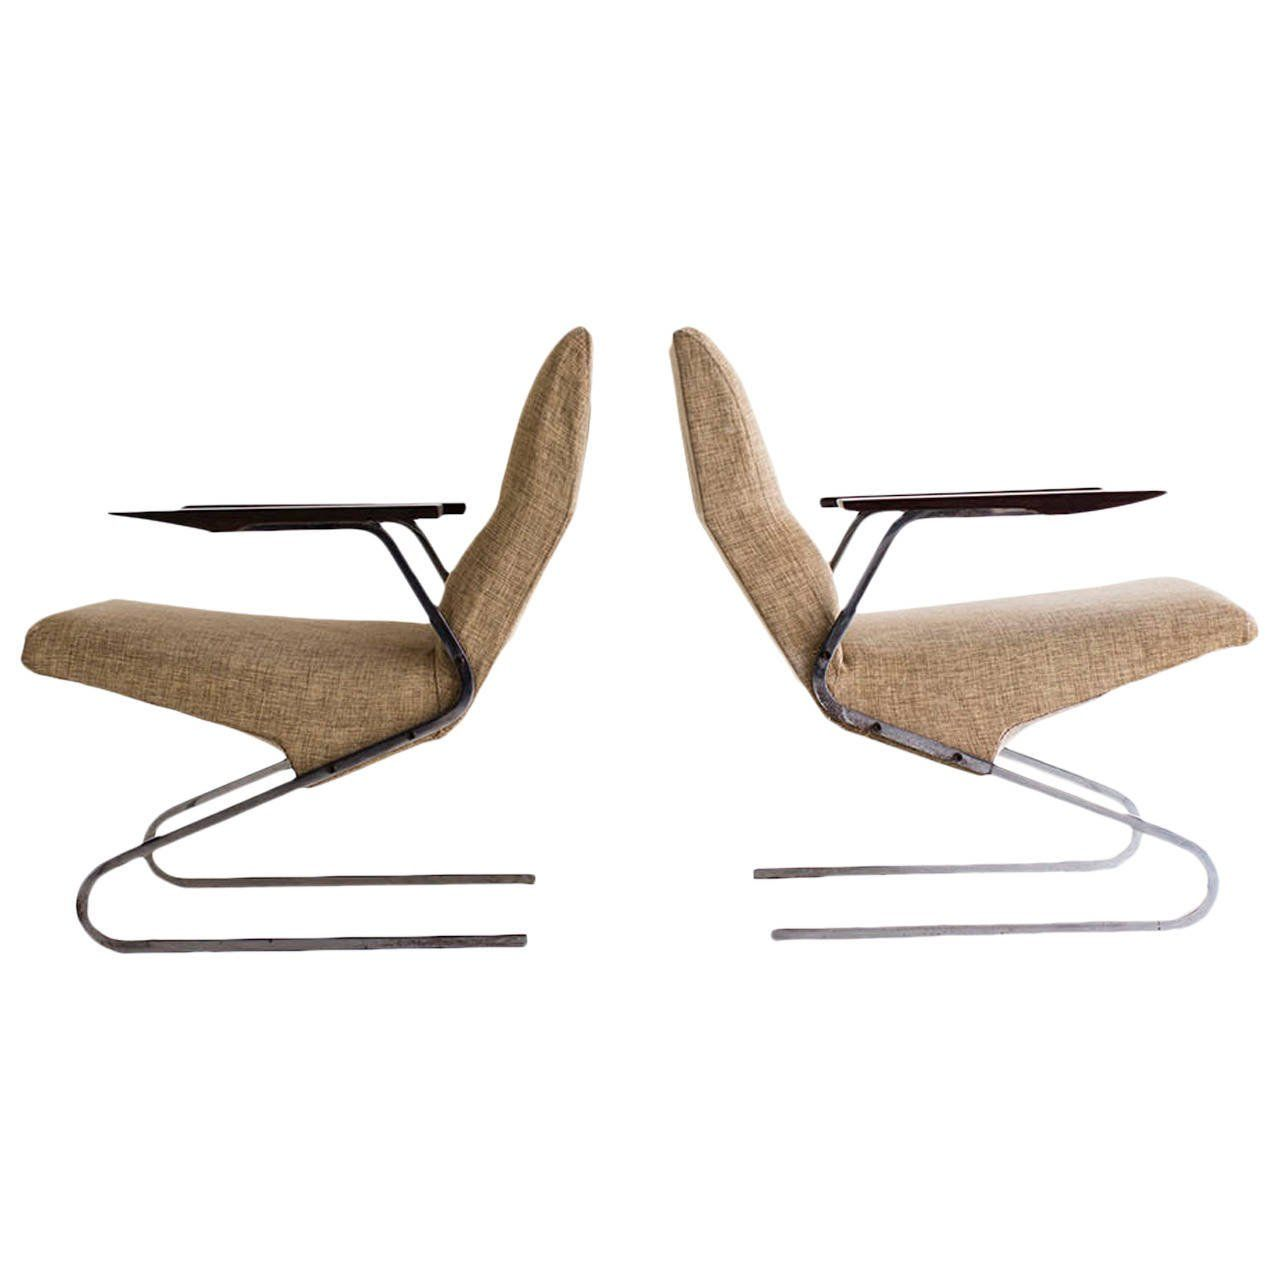 Georges Vanrijk Lounge Chairs For Beaufort Vintage Lounge Chair Lounge Chair Furniture Design Modern